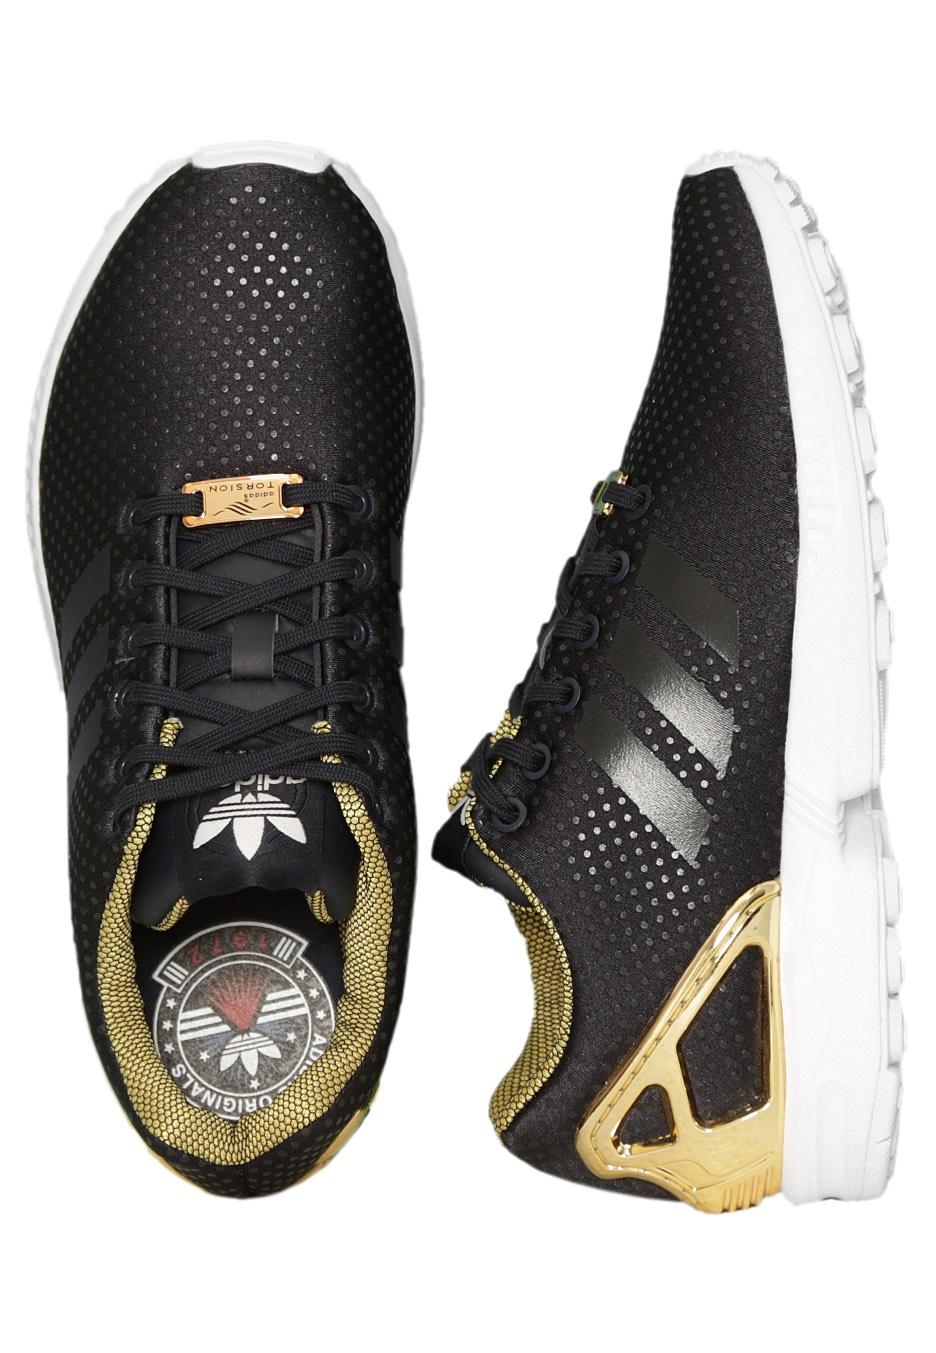 Adidas Zx Flux Damen Blau Gold ifgs